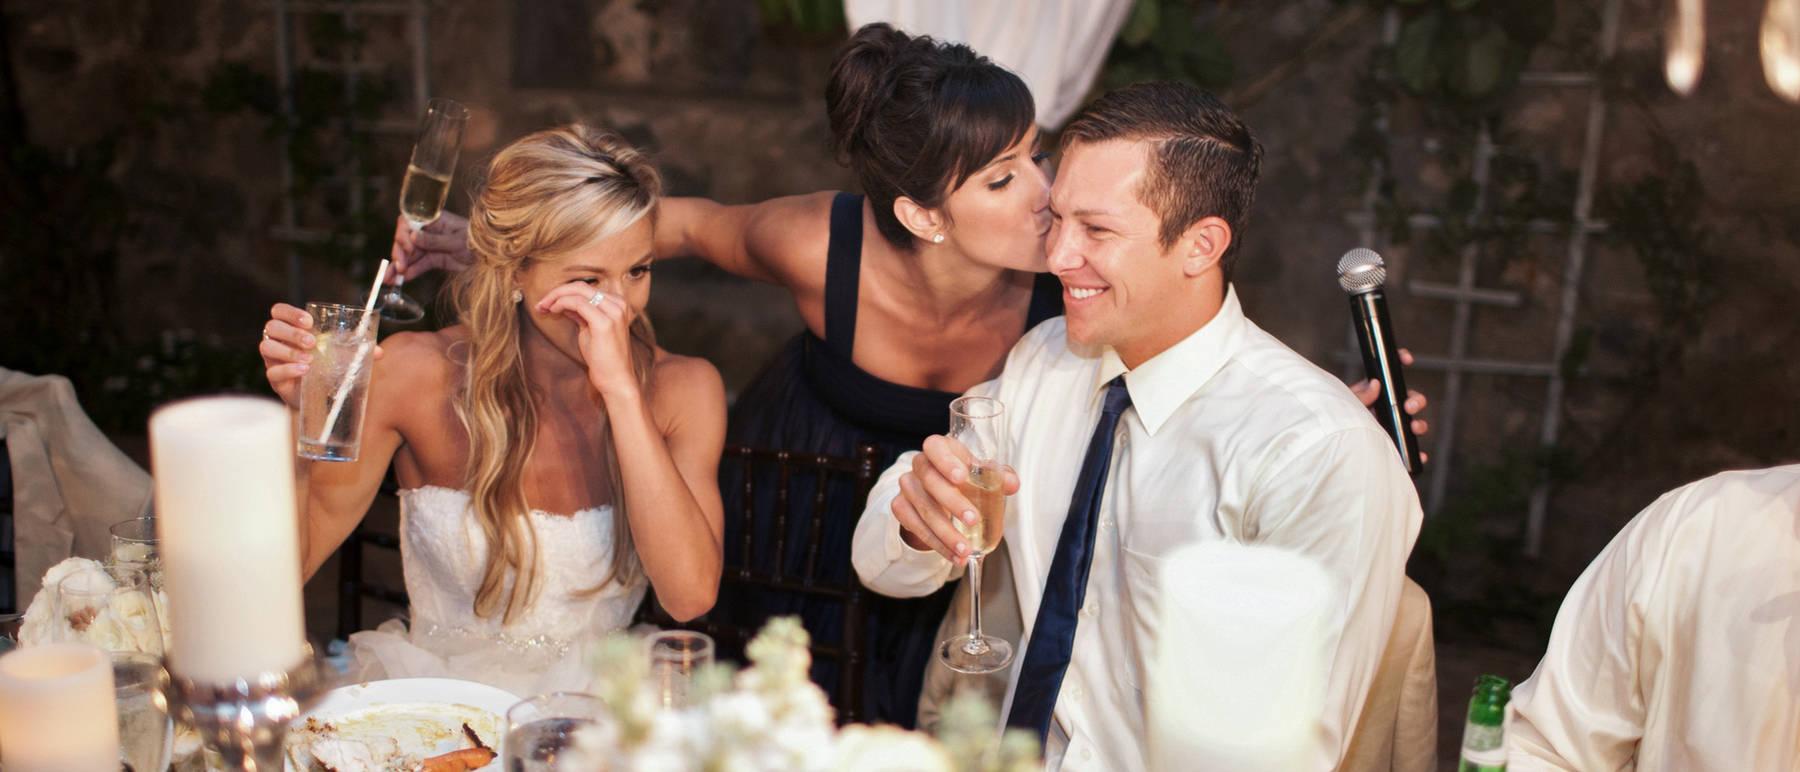 johnandjoseph-wedding-photographer-hz-slider-243